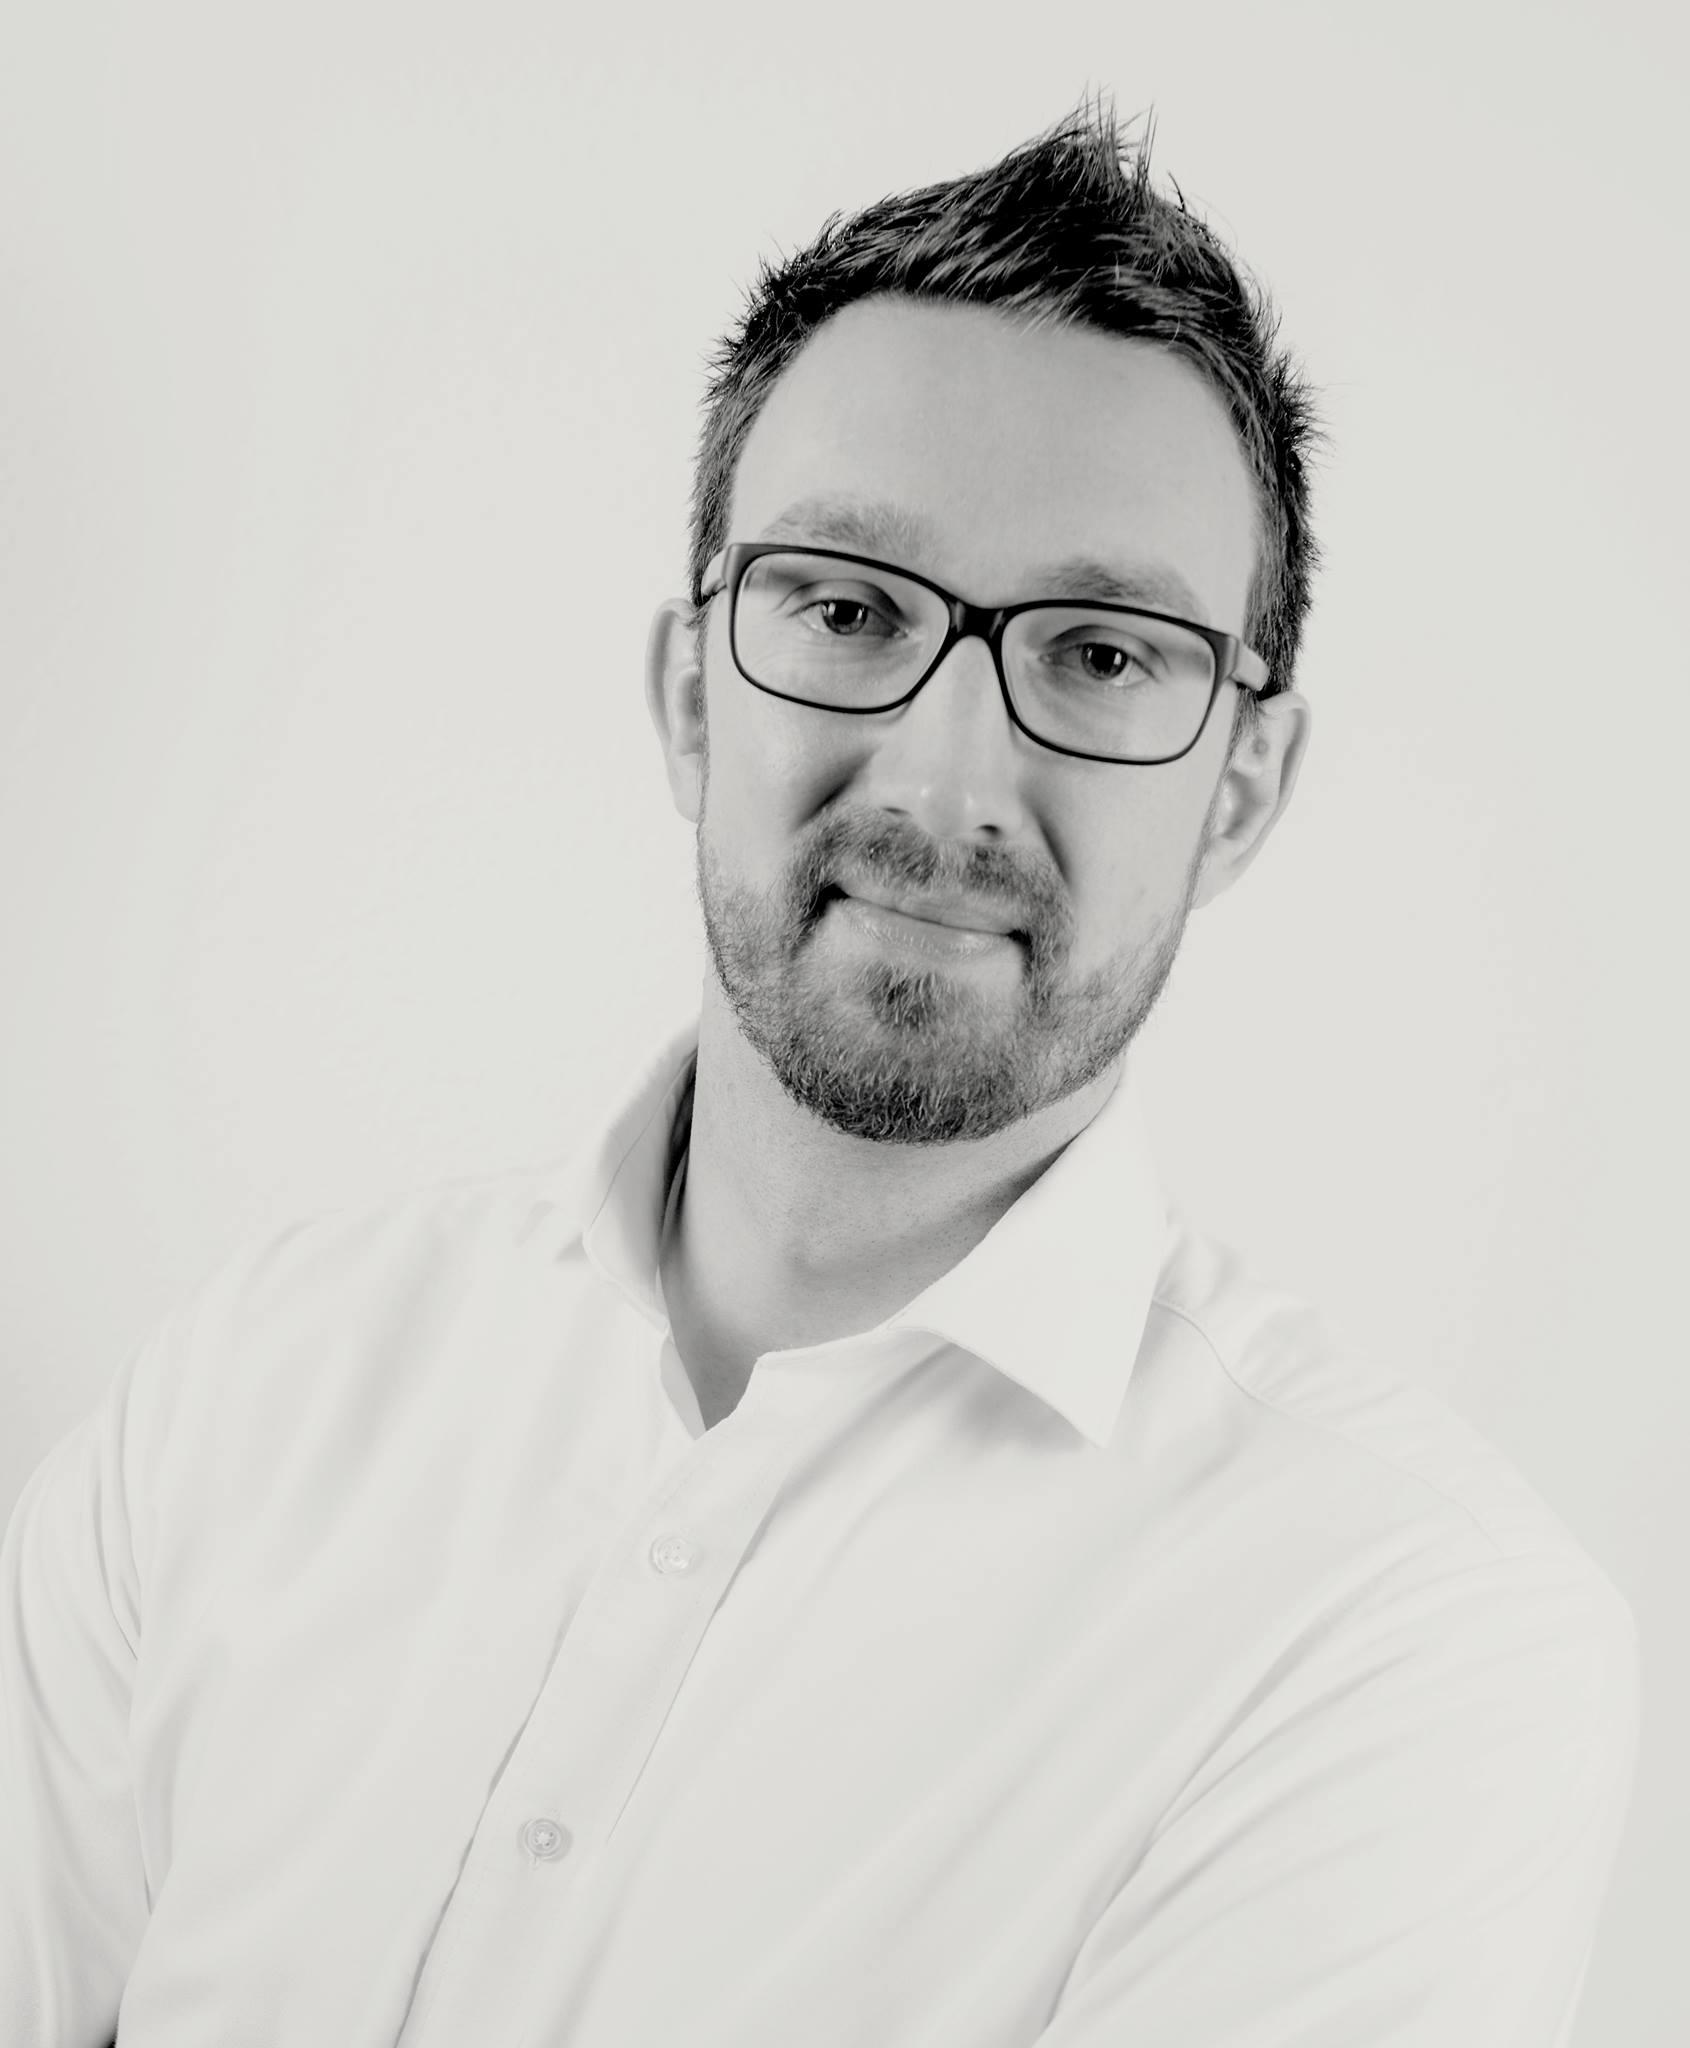 Fotograf Jürgen Jauth